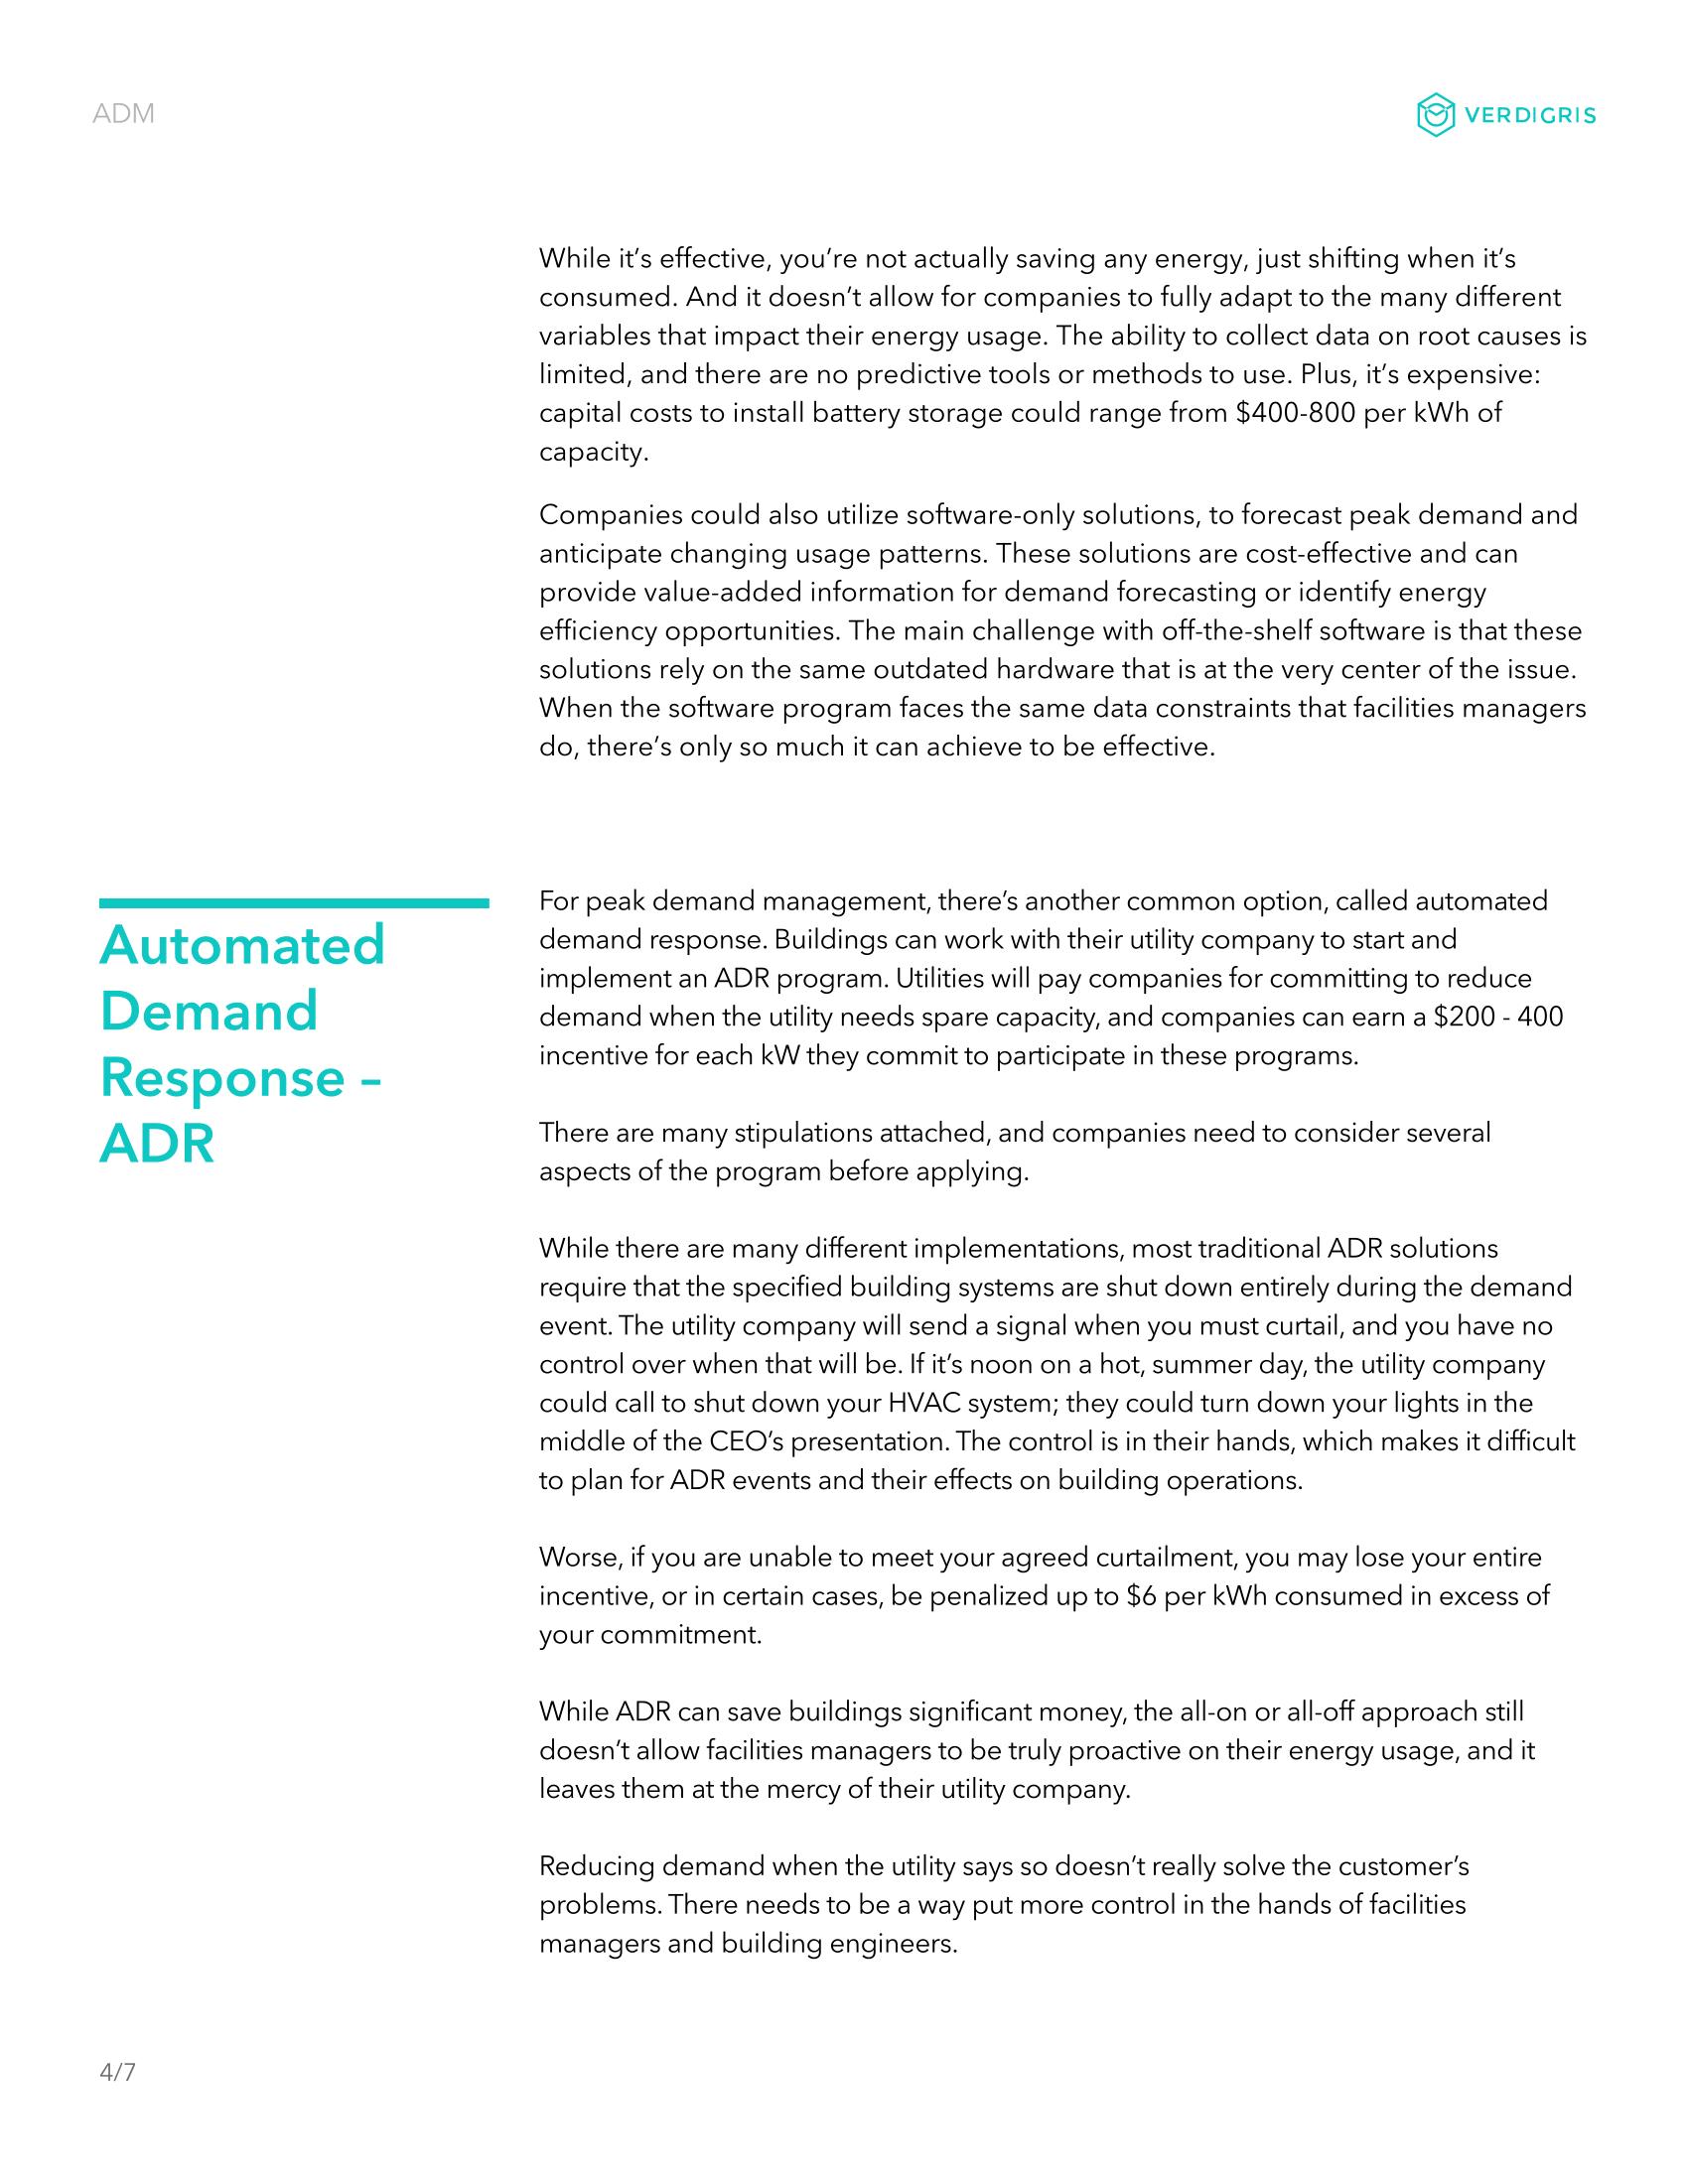 Automated Demand Management 4